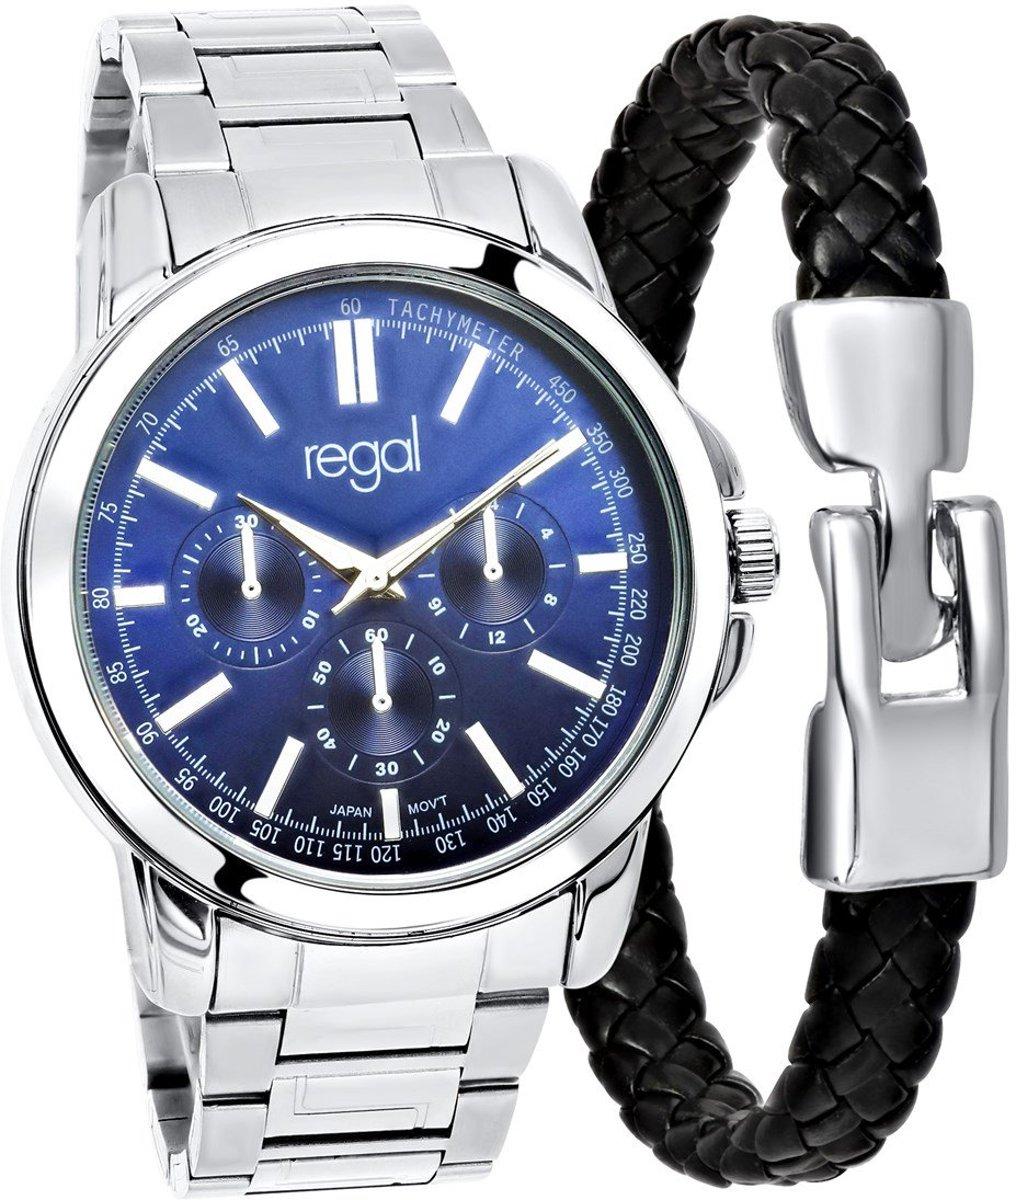 Regal - Regal cadeauset met gratis armband kopen